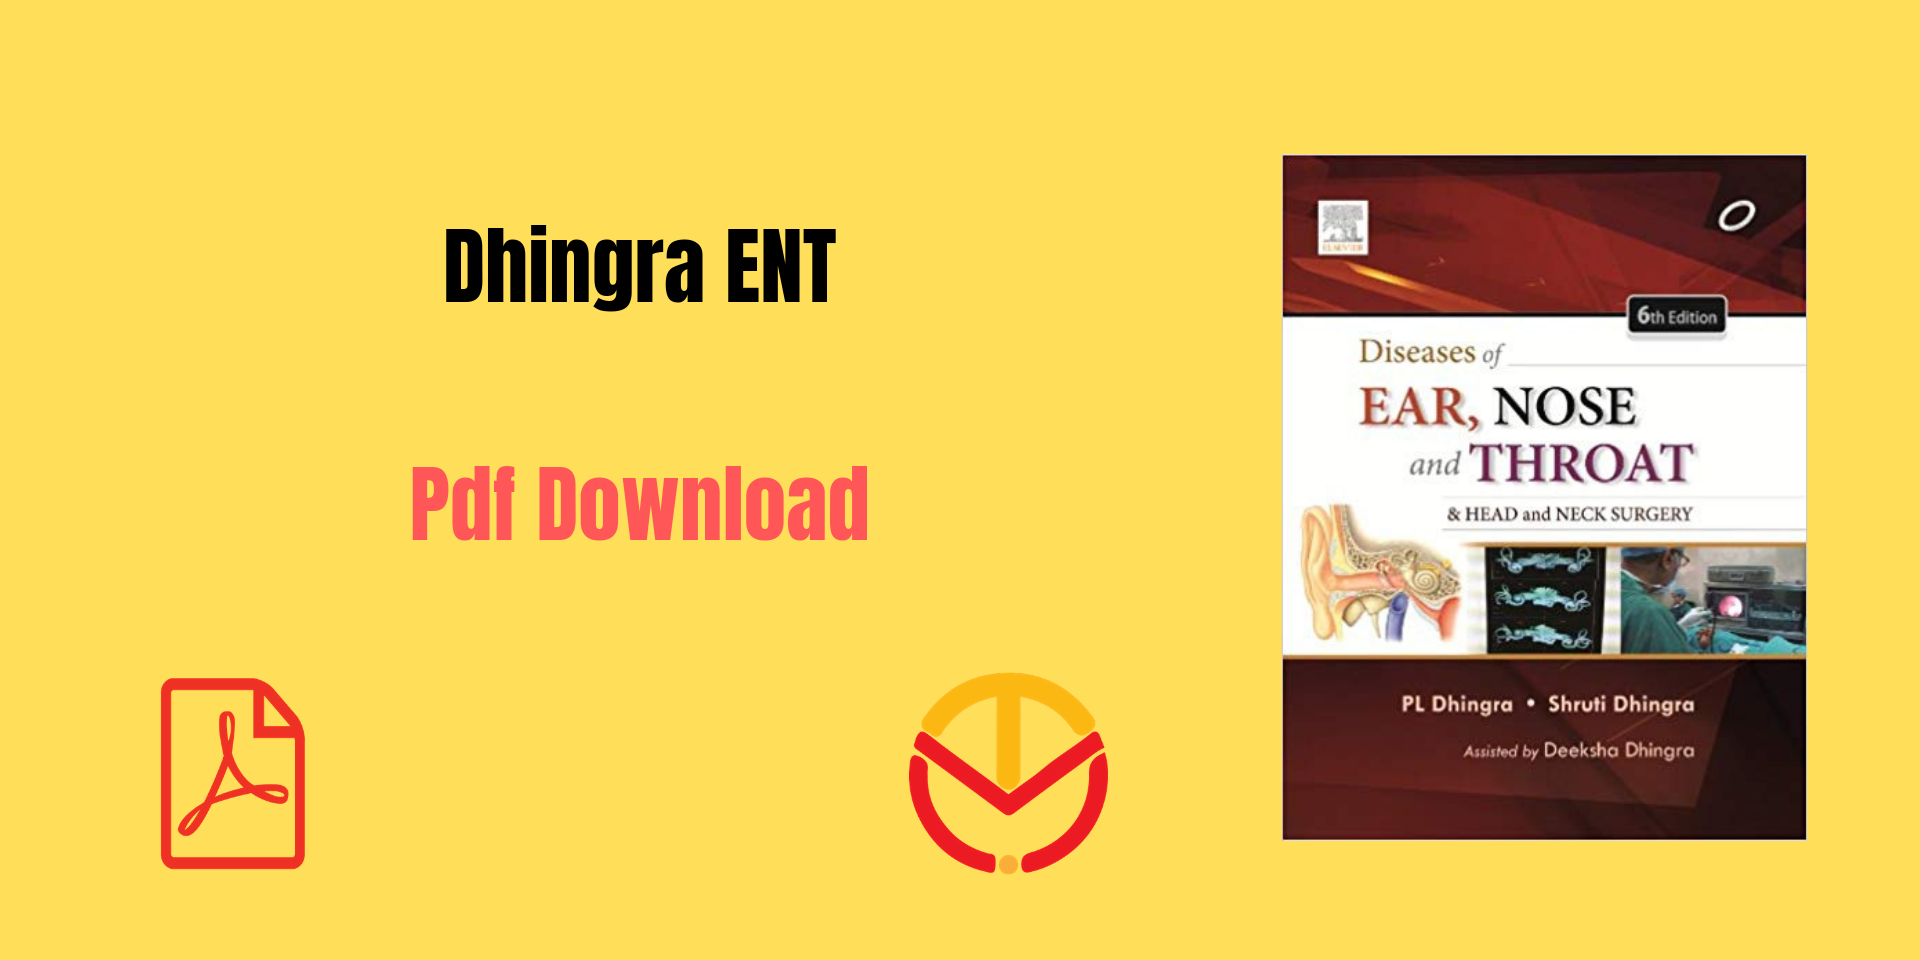 Dhingra ENT pdf